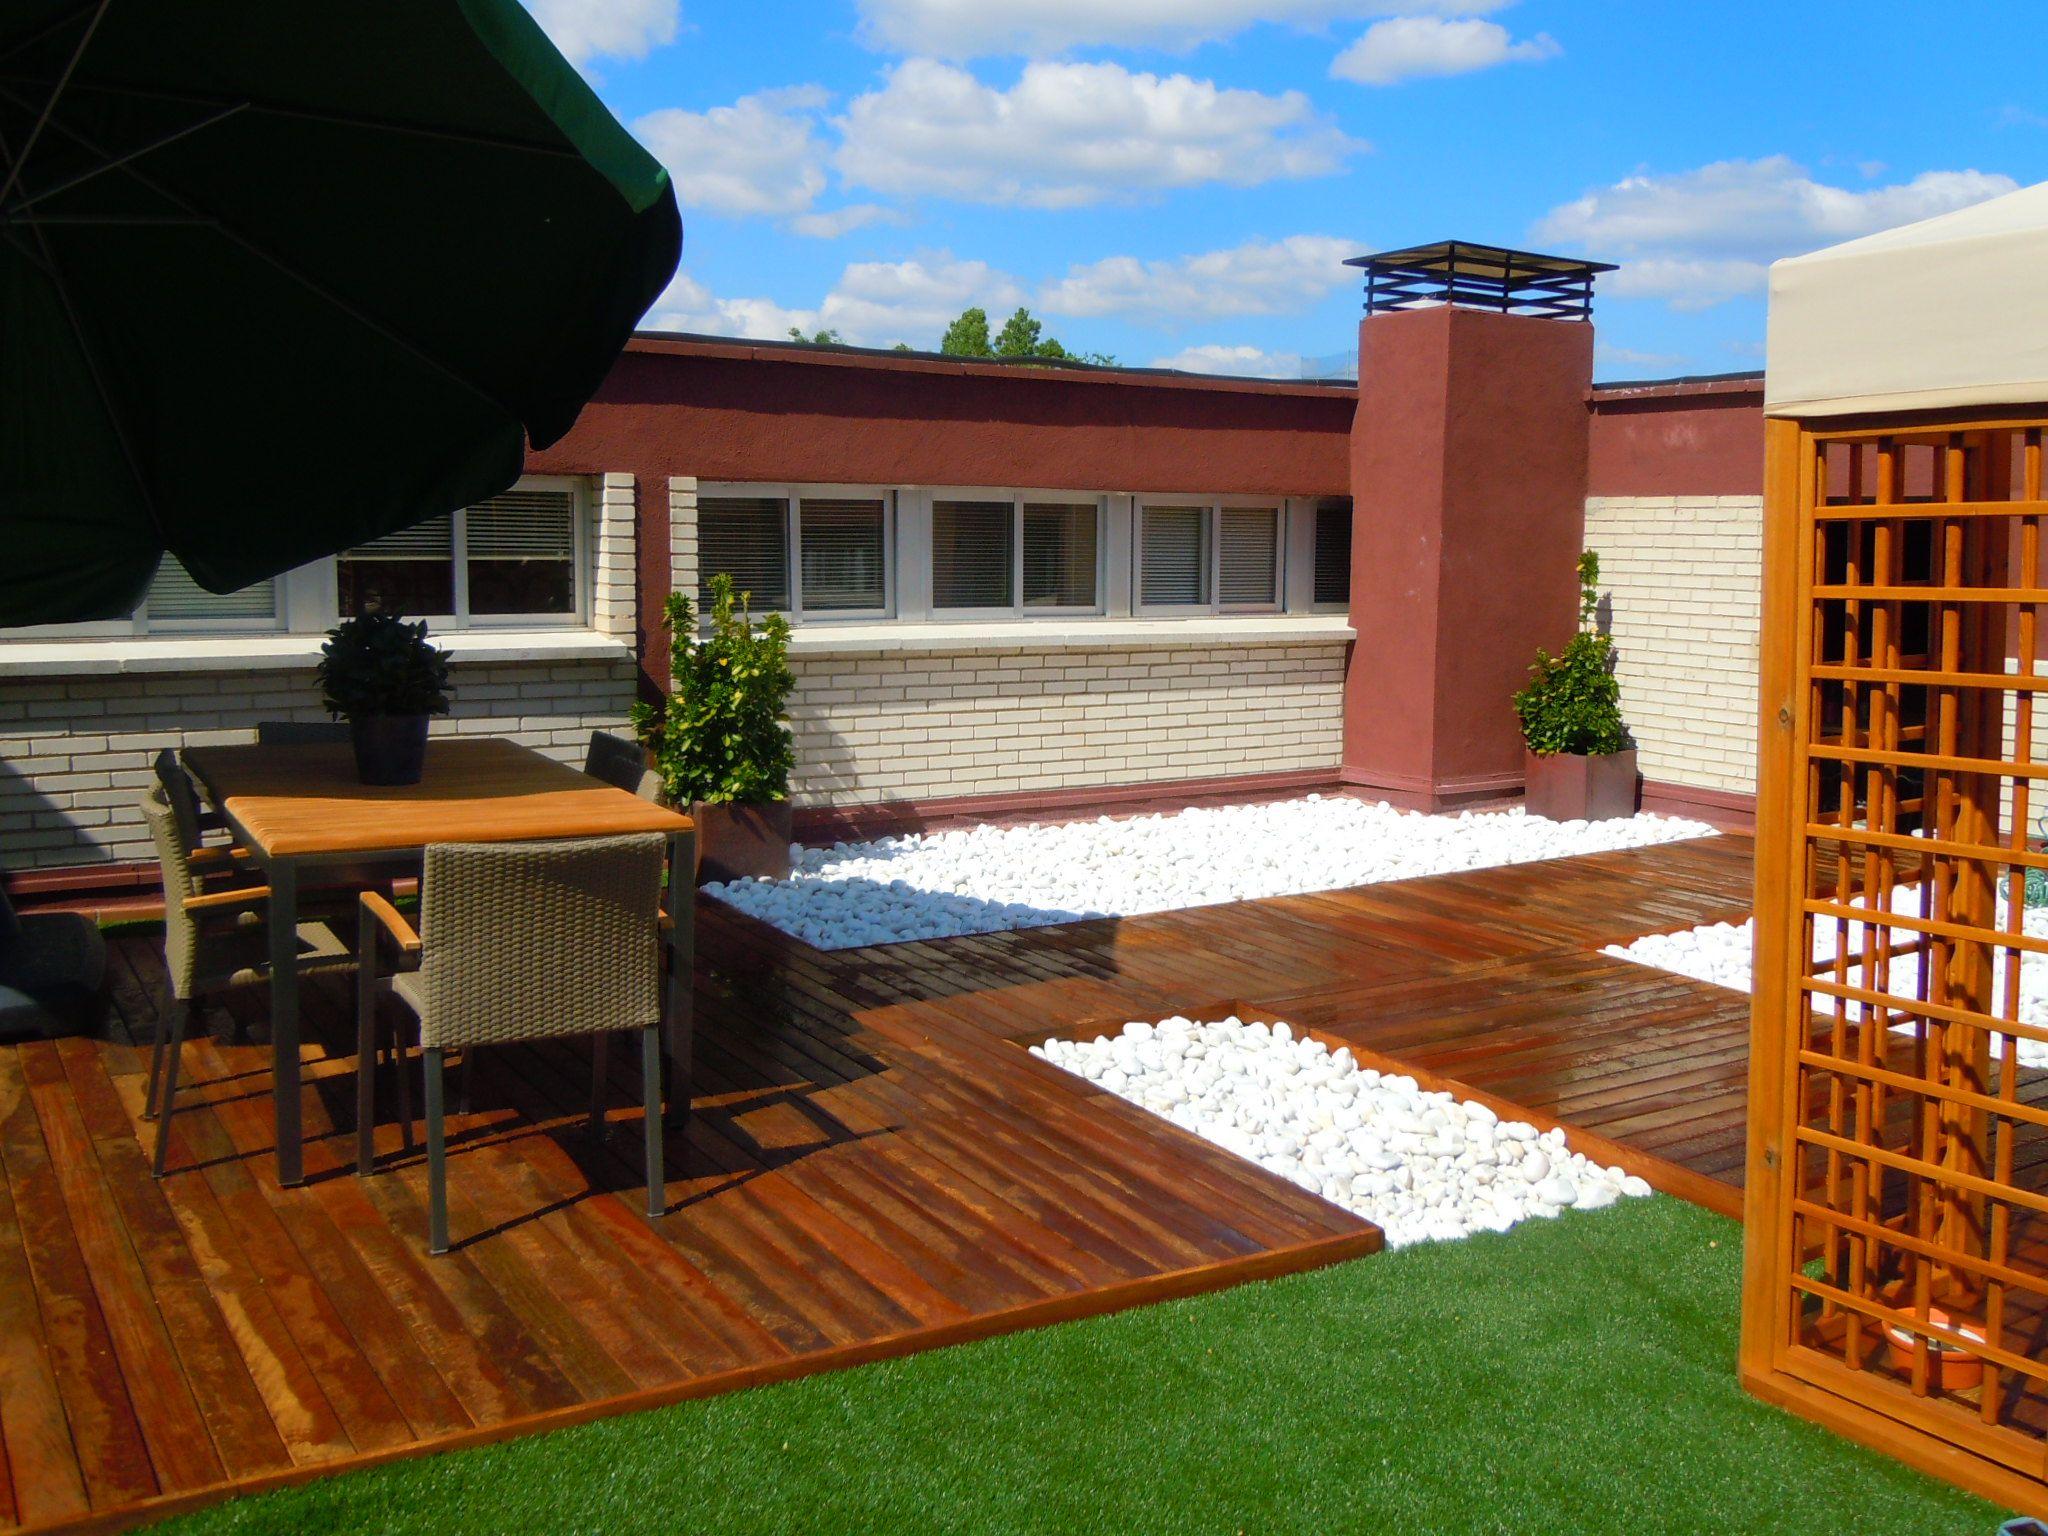 Terraza con c sped artificial y tarima de madera ipe http - Cesped artificial terraza ...